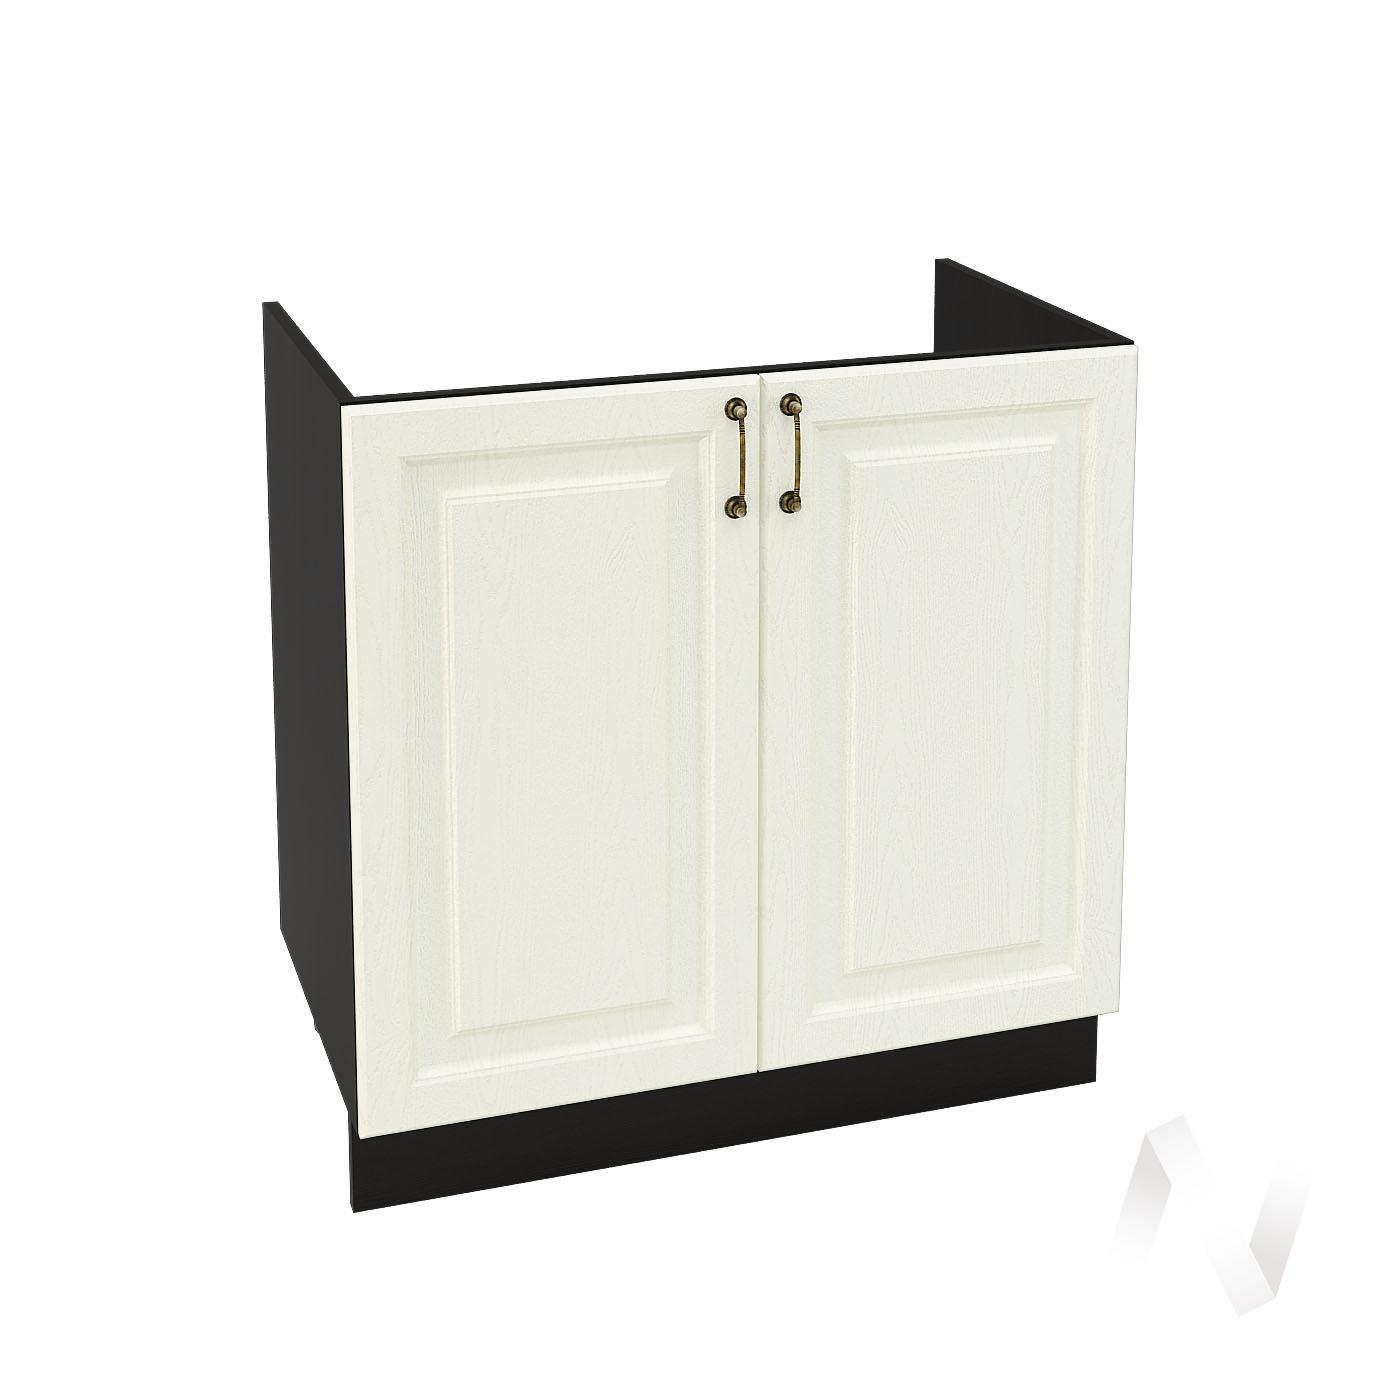 "Кухня ""Ницца"": Шкаф нижний под мойку 800, ШНМ 800 (Крем/корпус венге)"